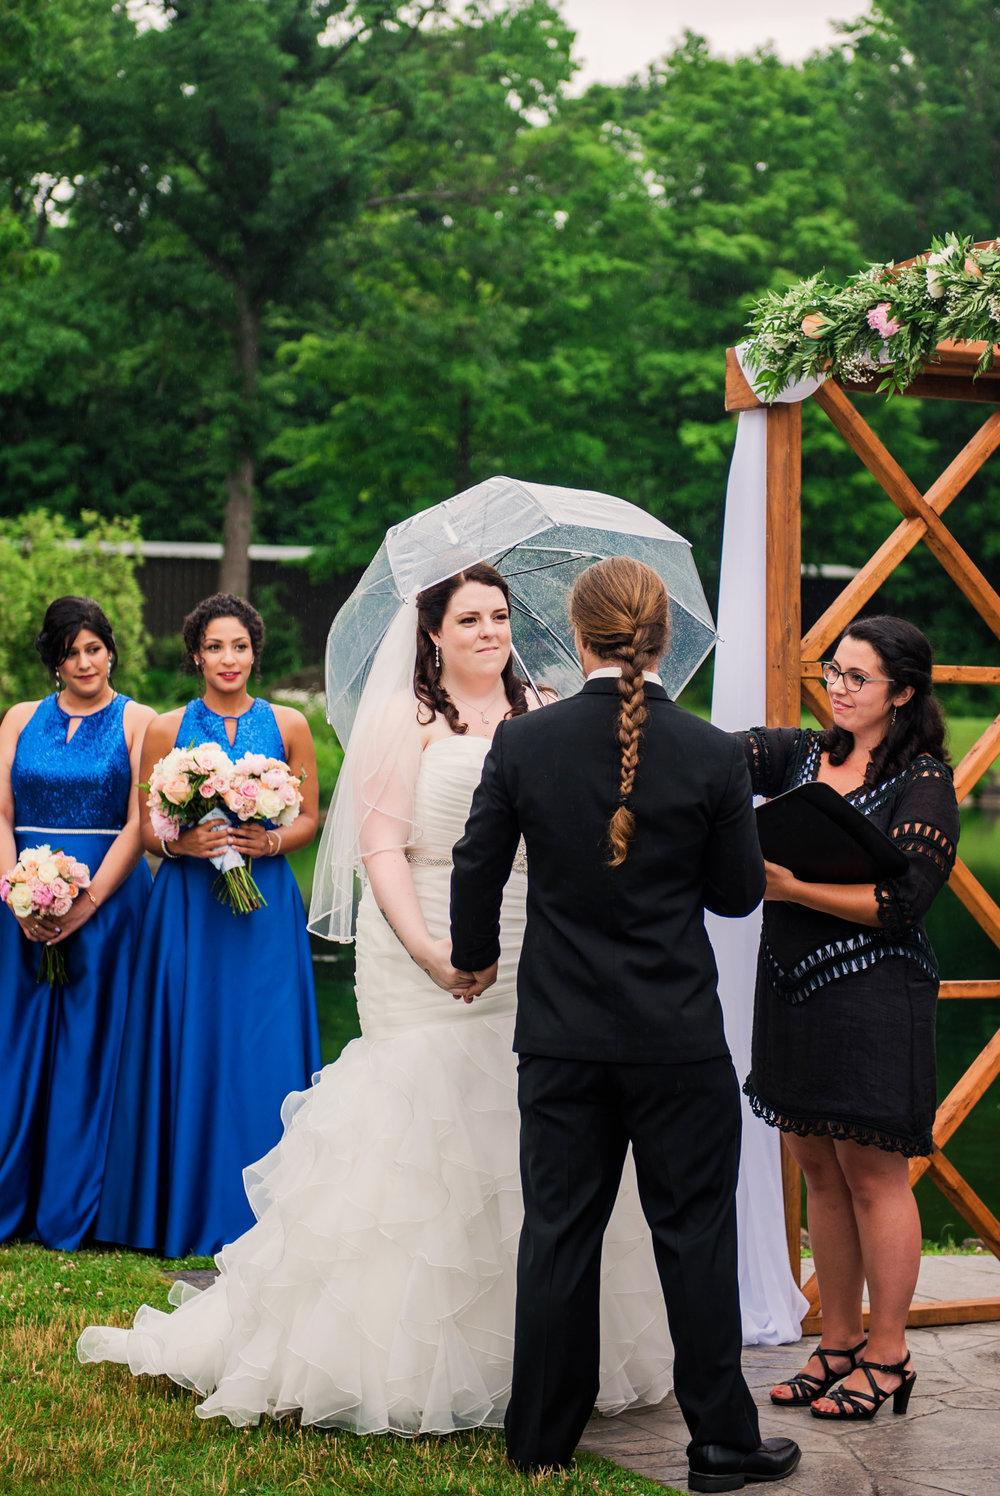 JILLSTUDIO_Shadow_Lake_Rochester_Wedding_Rochester_NY_Photographer_DSC_4206.jpg